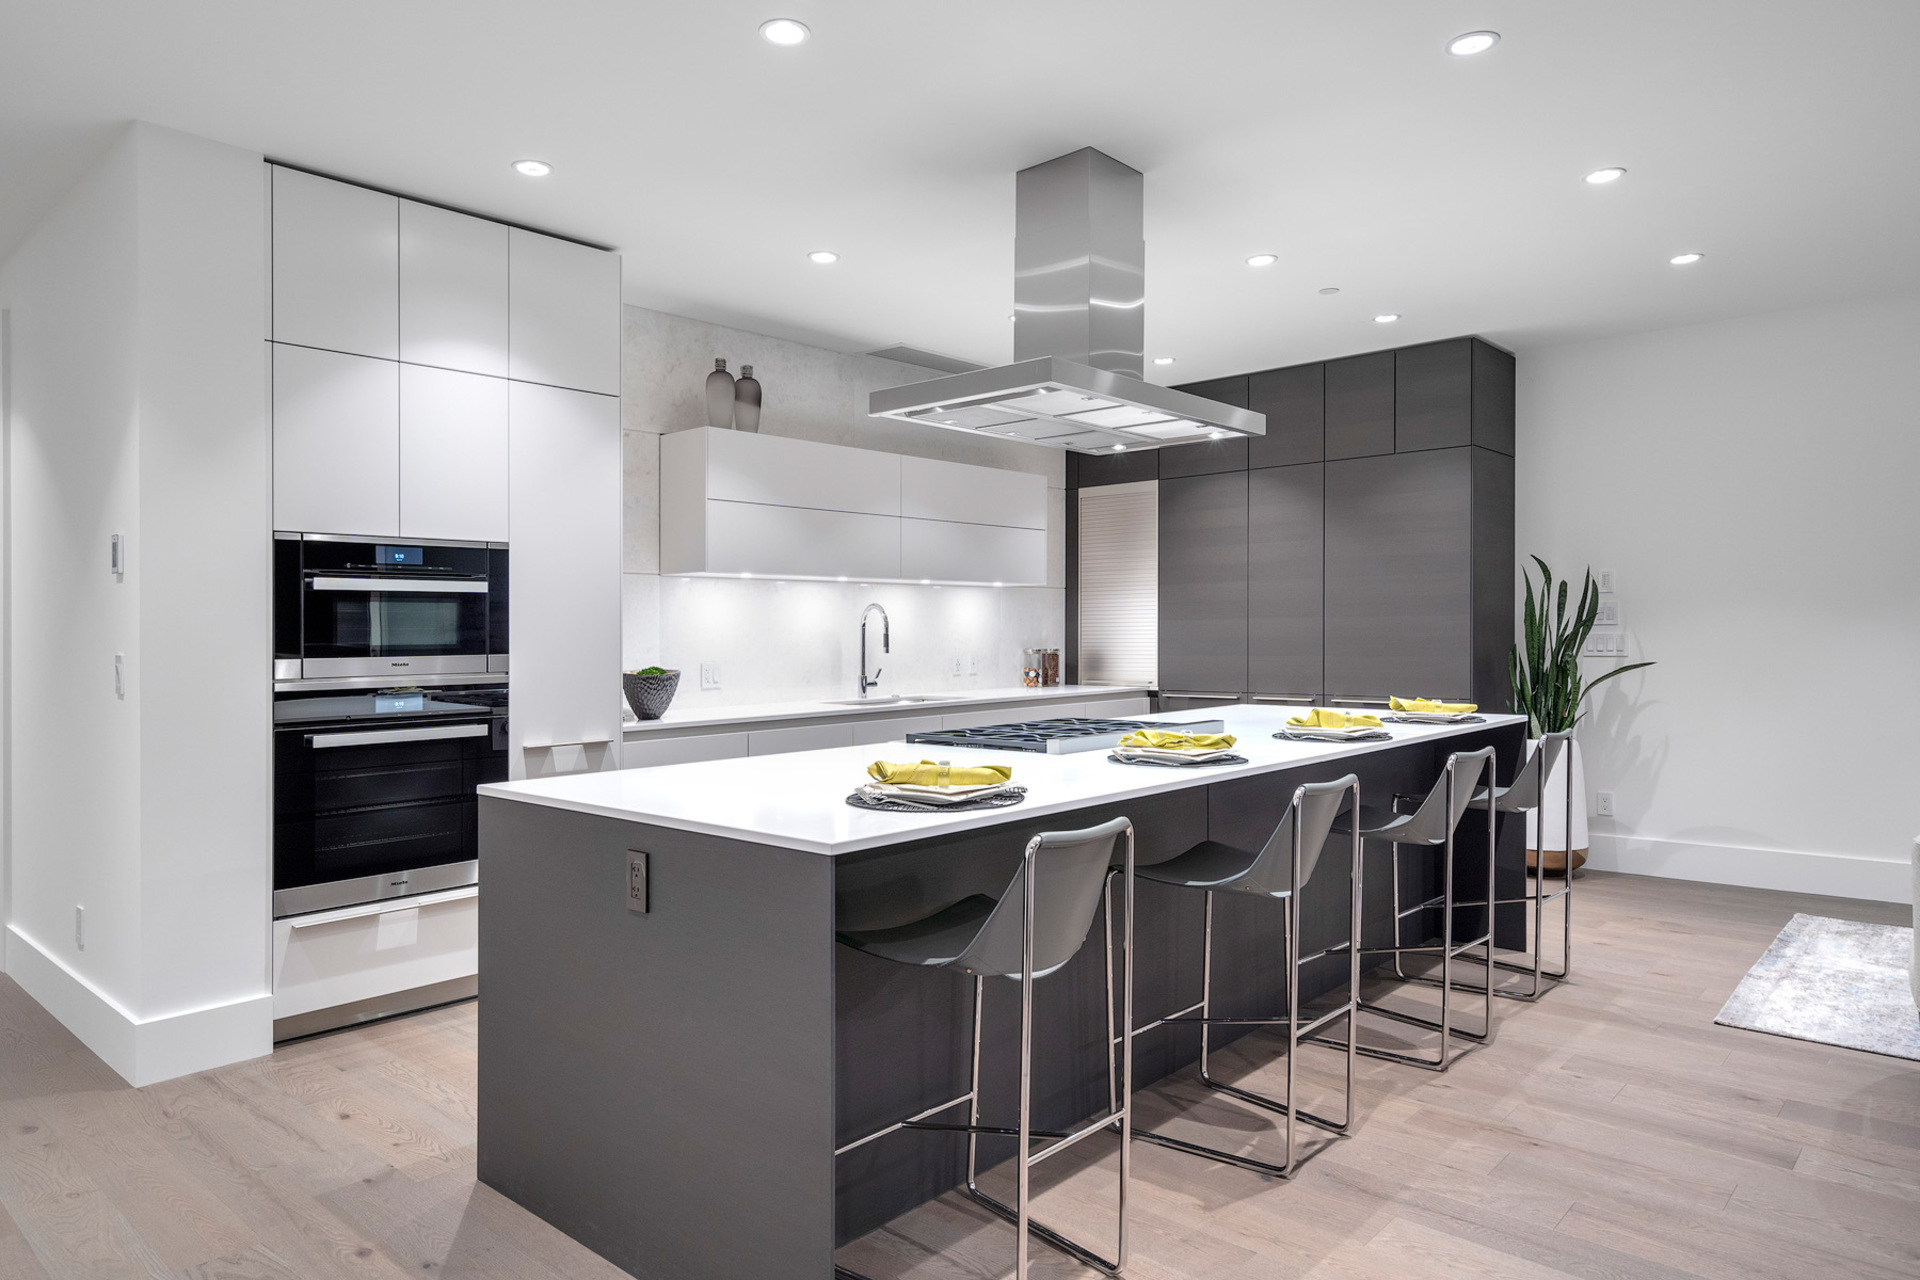 kitchen-2 at 402 - 2958 Burfield Place, Cypress Park Estates, West Vancouver